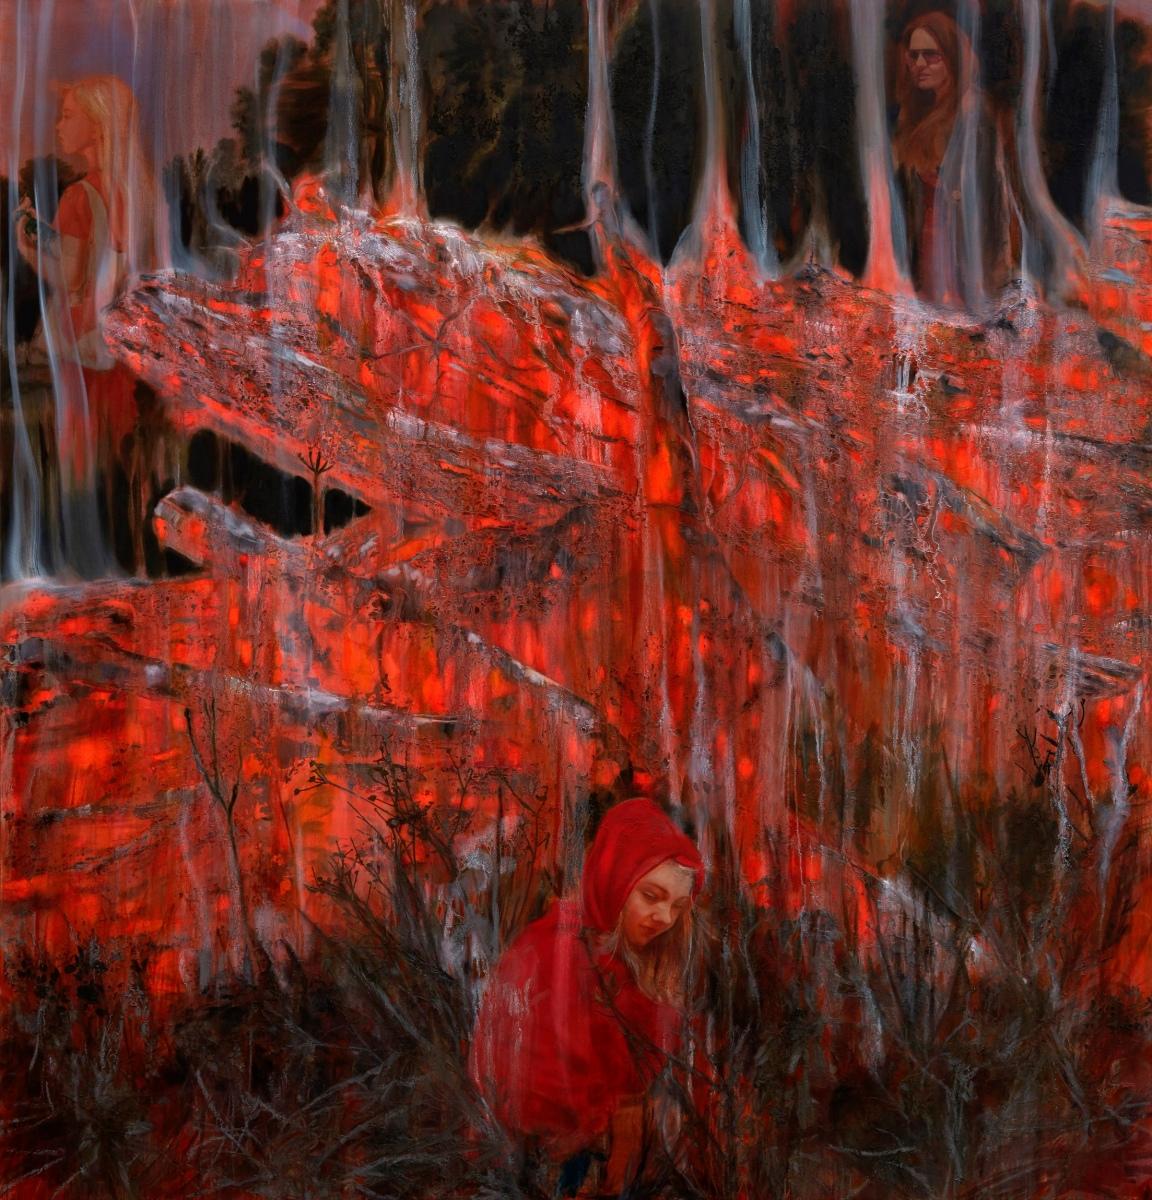 Embers – Nigel Cooke